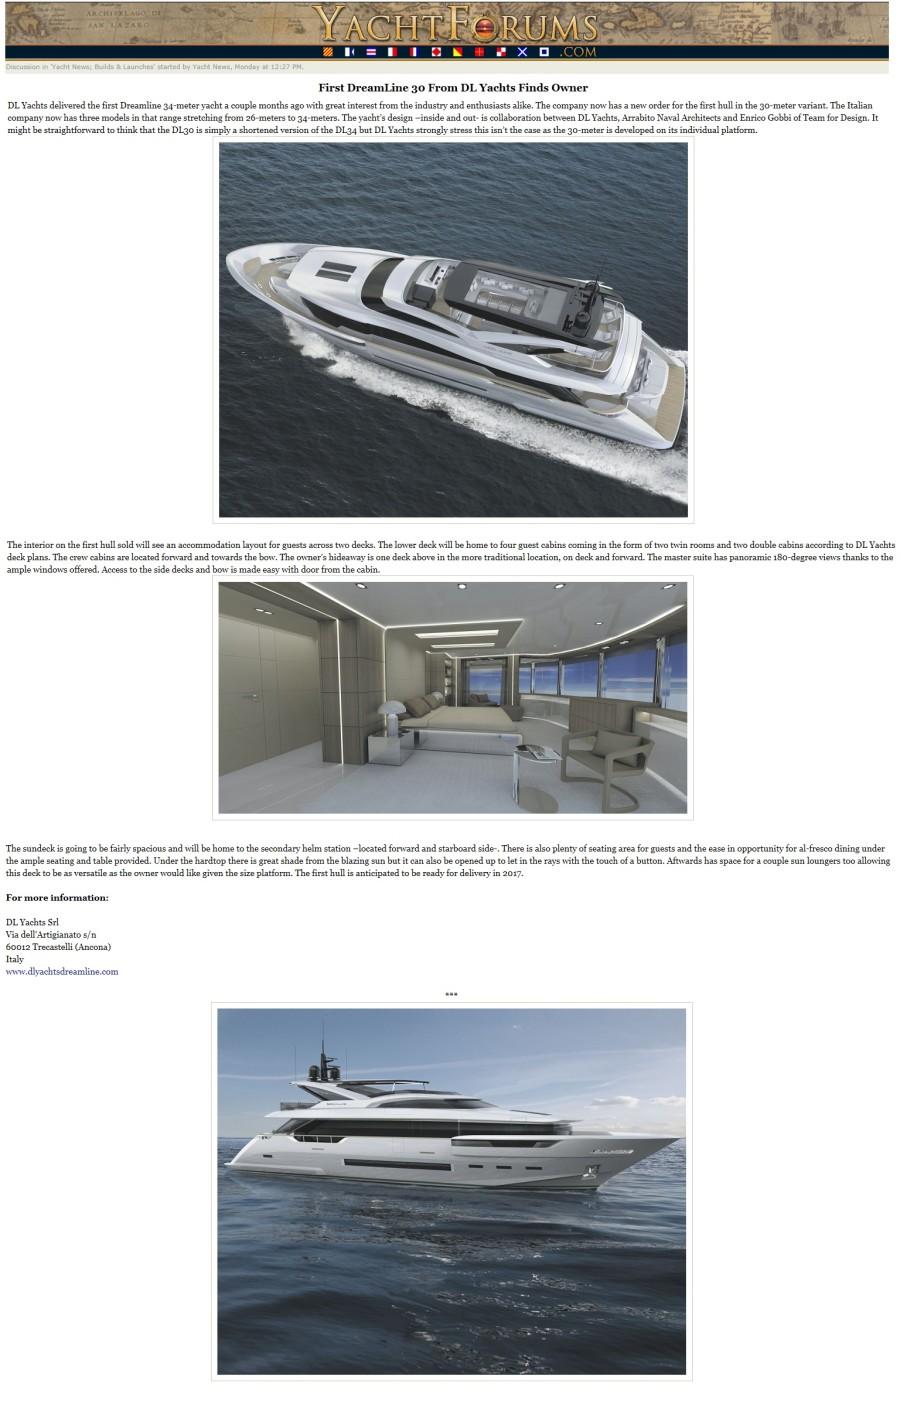 january_2016_yachtforums